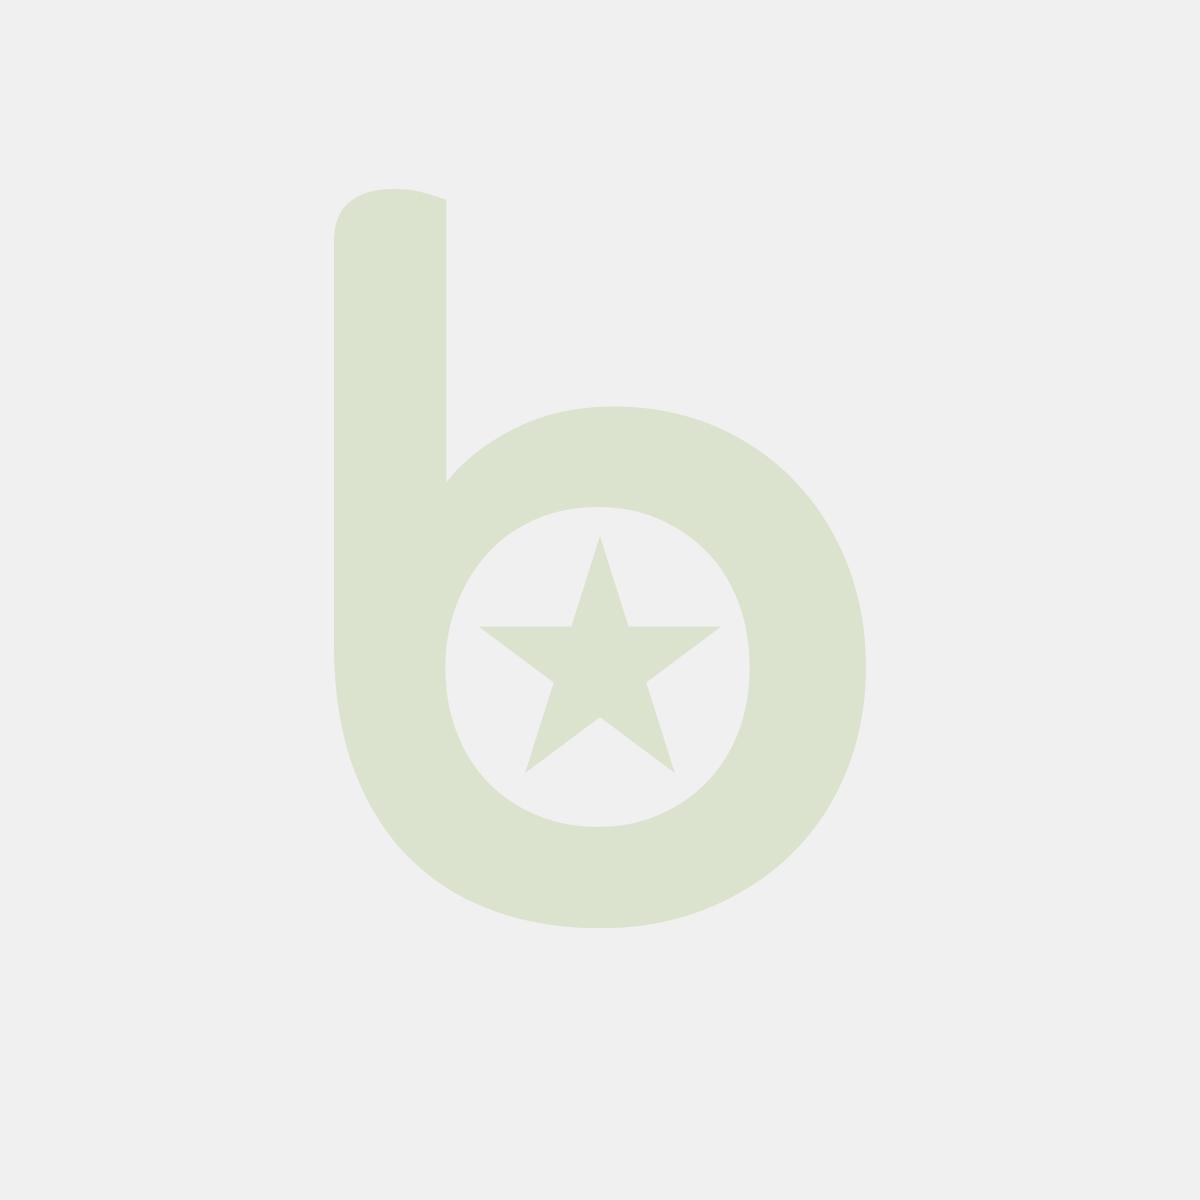 Gumki recepturki pud.wysokie E&D 60g